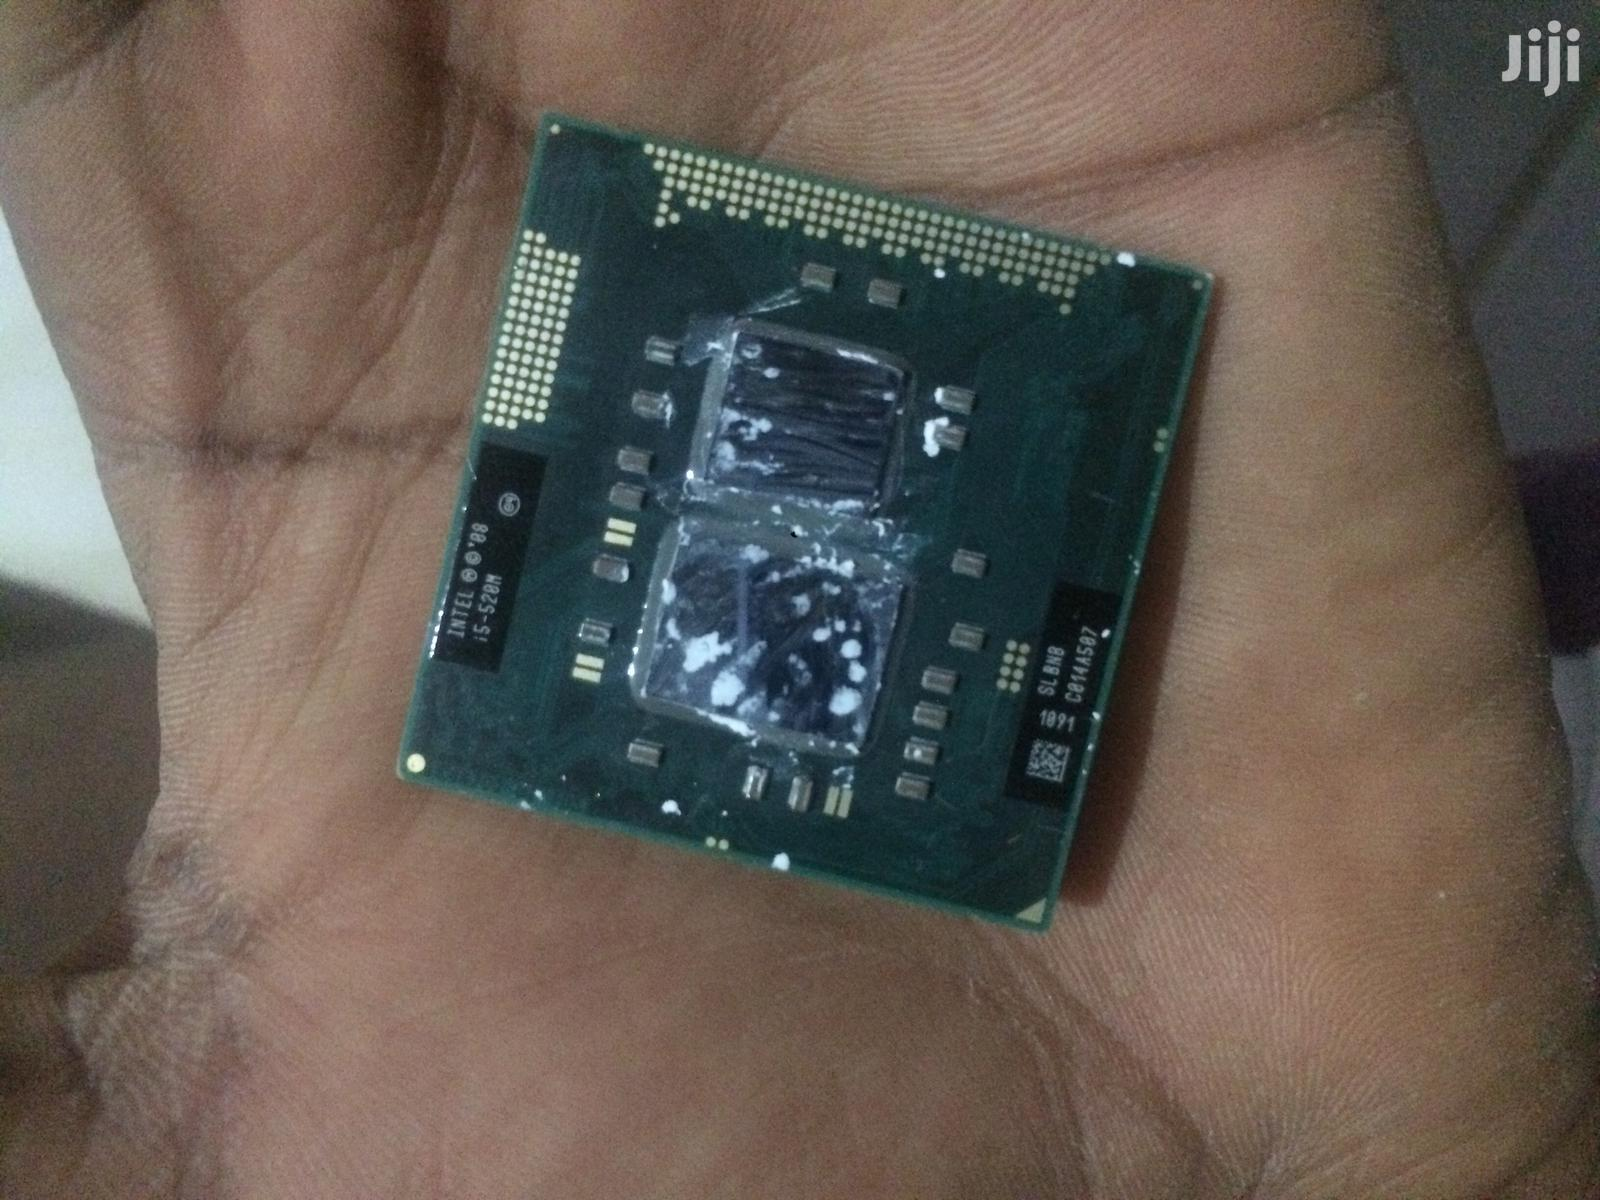 Intel Core I5-520m Processor | Computer Hardware for sale in Ga South Municipal, Greater Accra, Ghana